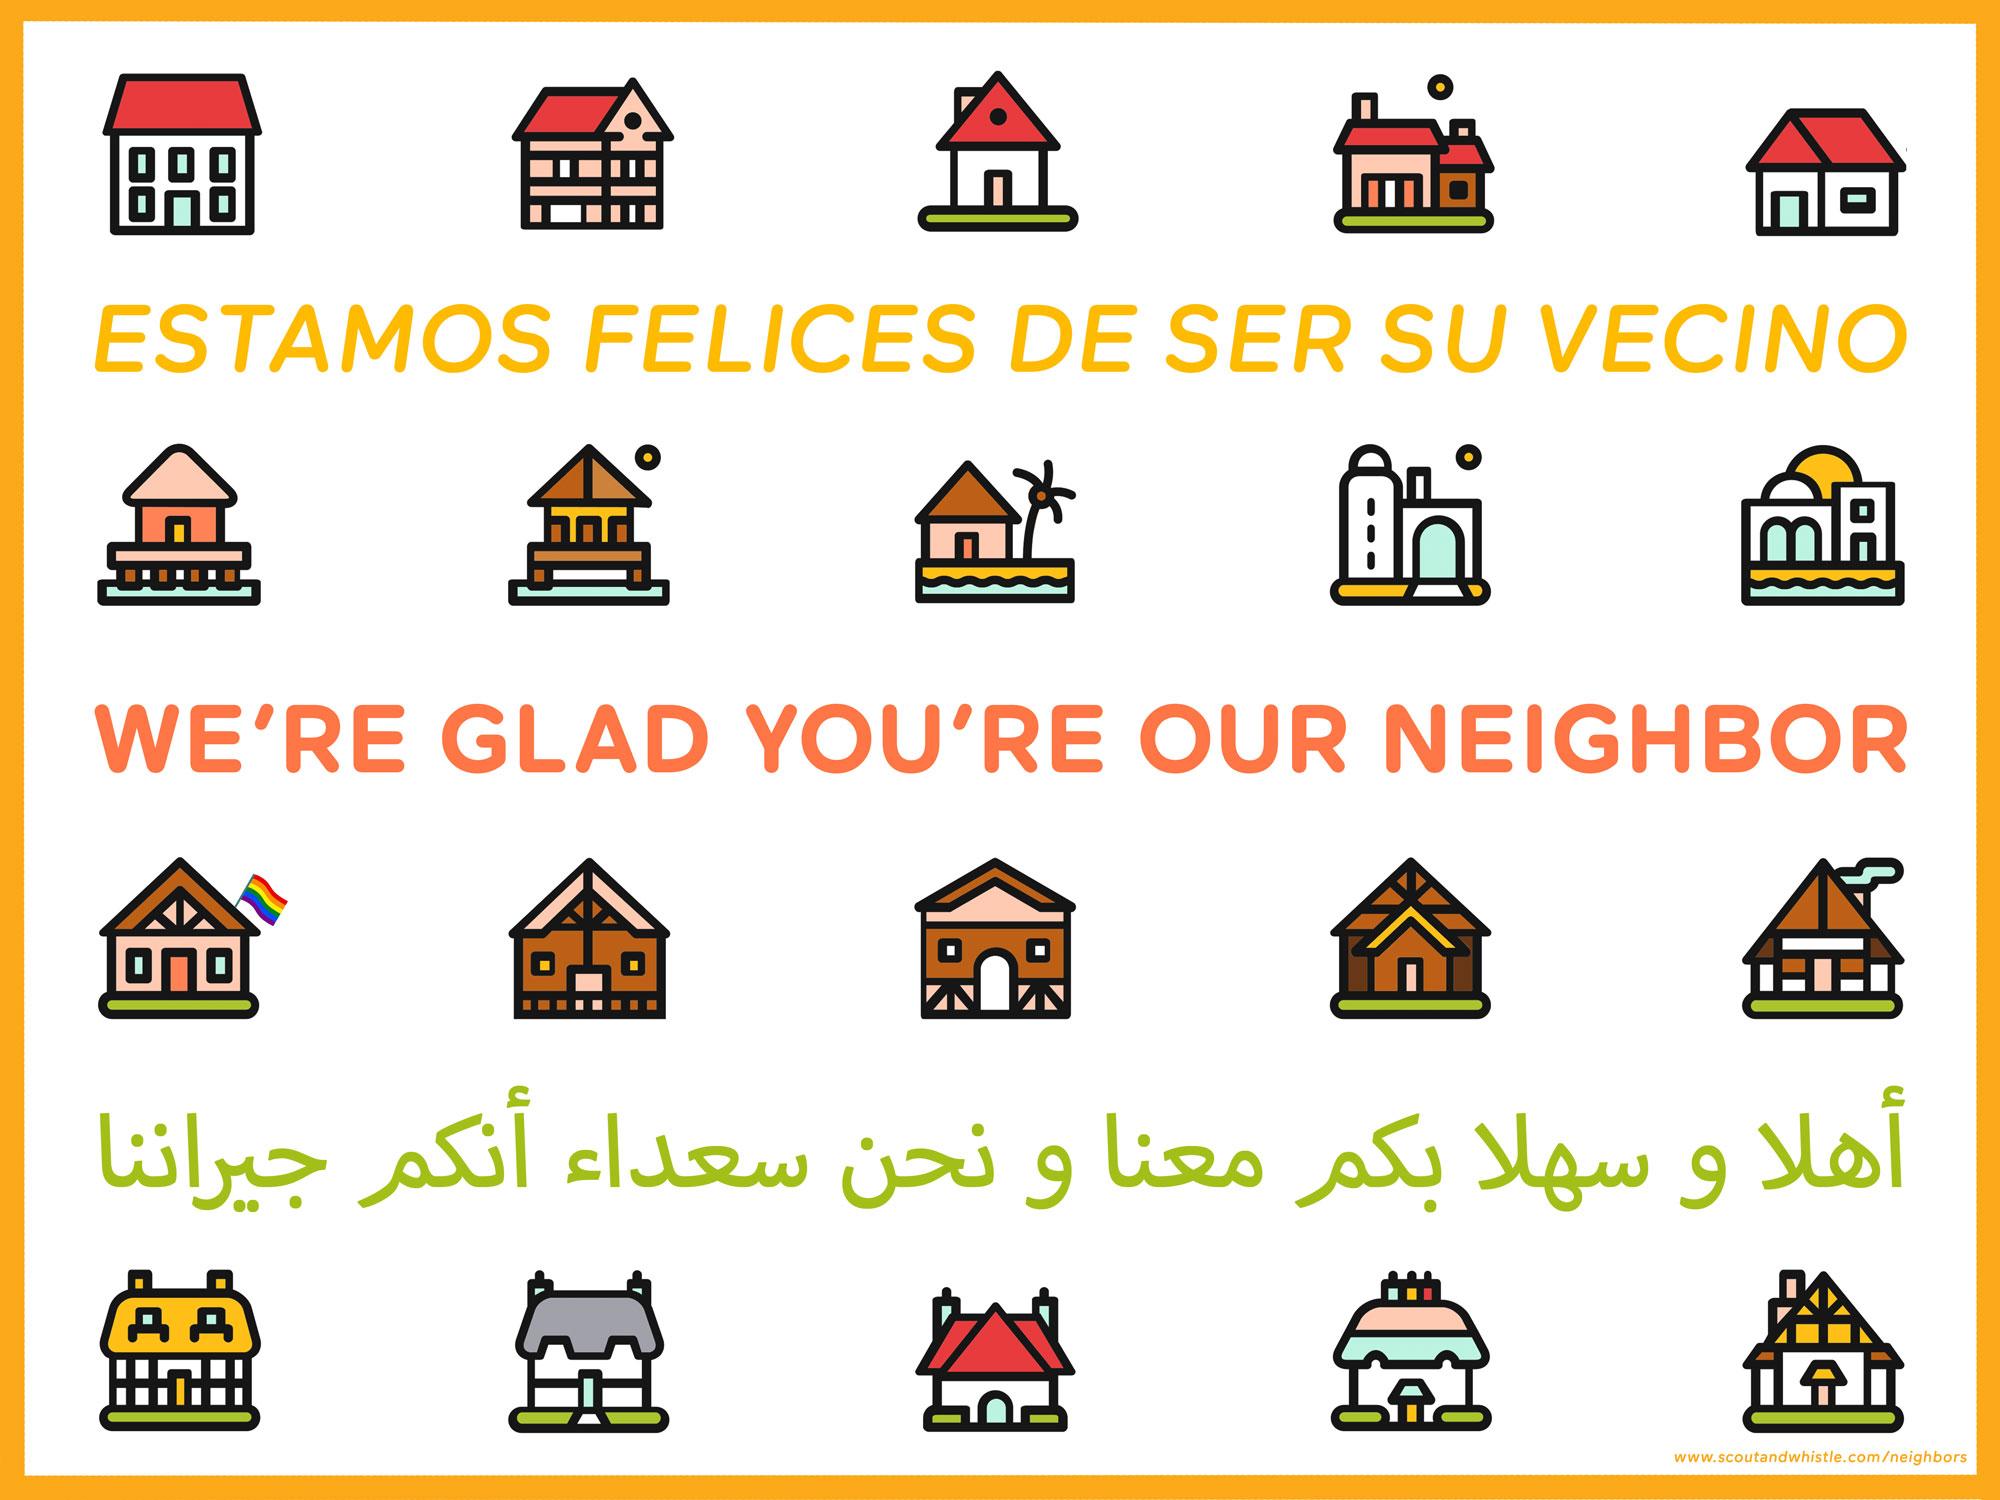 neighbors_white_new_18x24.jpg